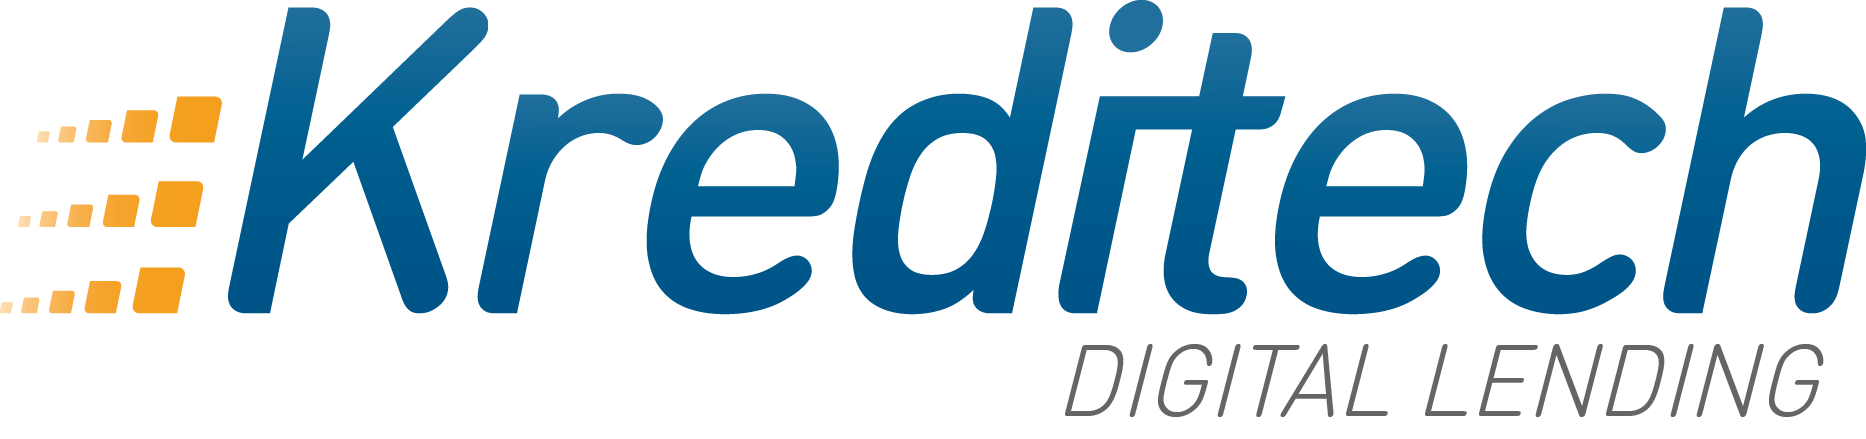 Kreditech_claim_Digital-Len